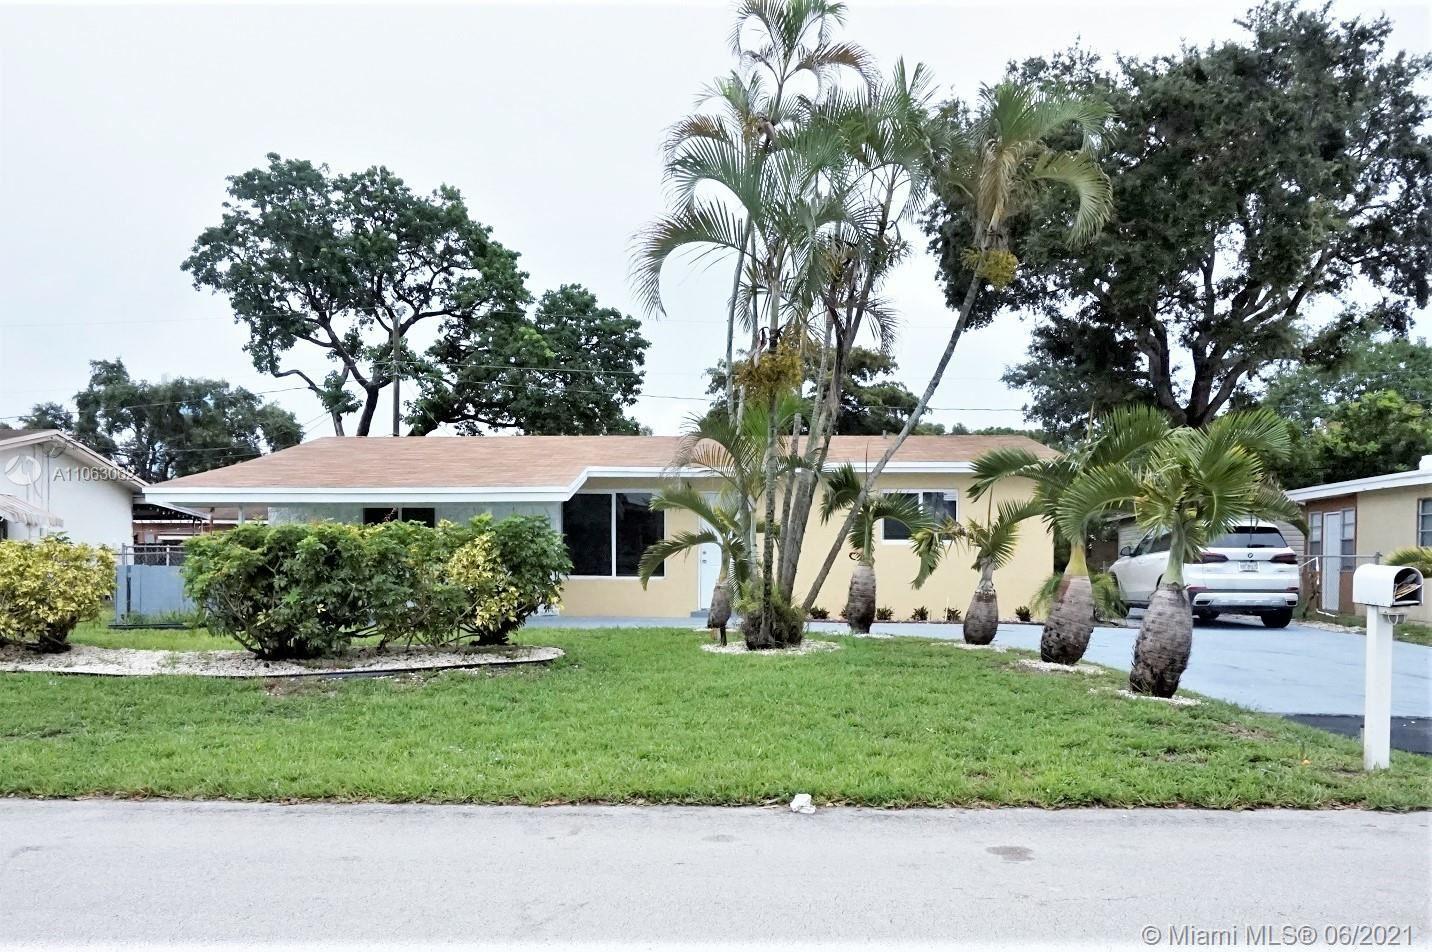 Photo of 5750 SW 54th Ave, Davie, FL 33314 (MLS # A11063062)